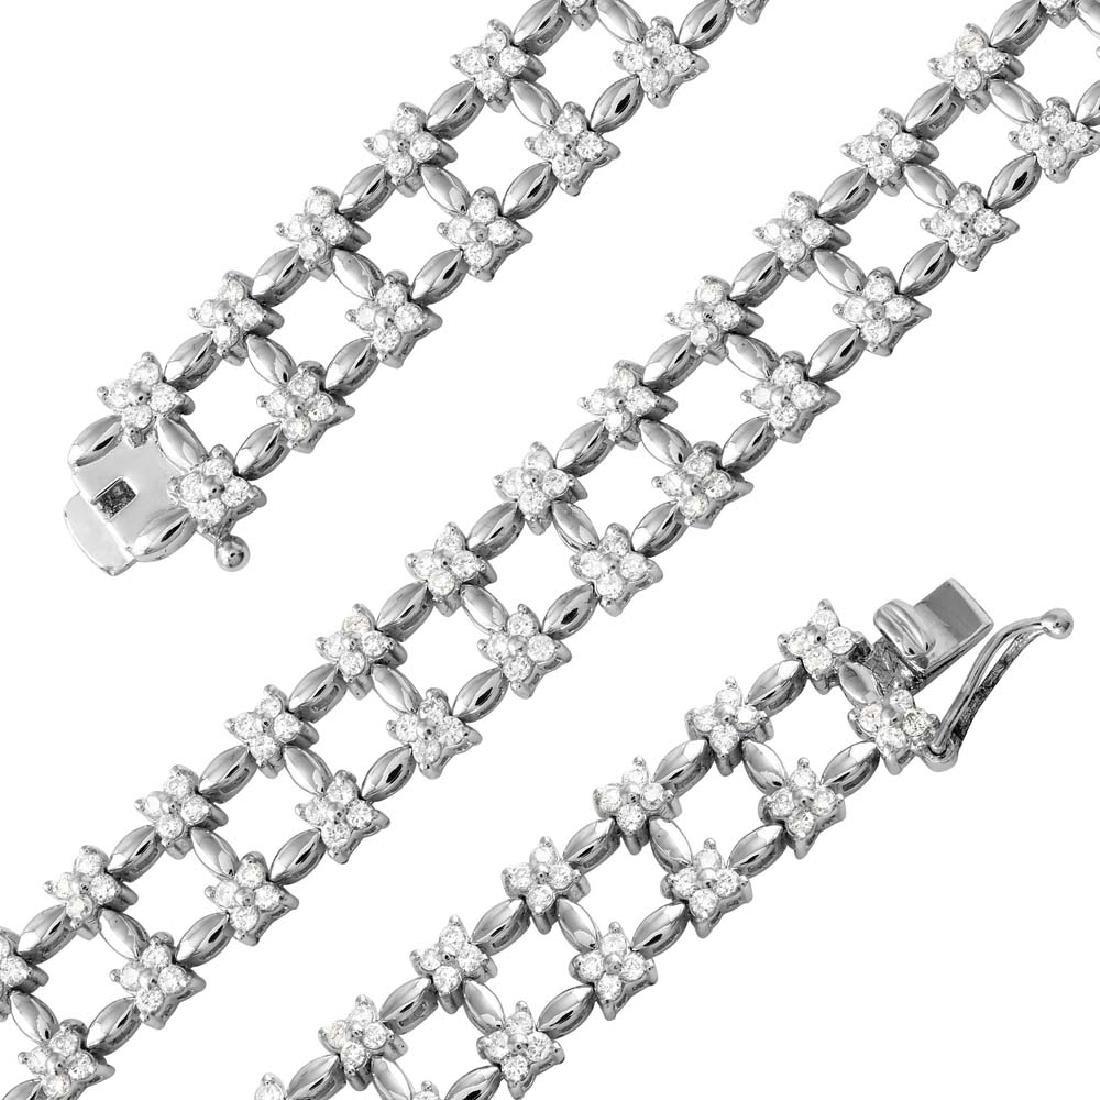 Genuine 3.15 TCW 18K White Gold Ladies Bracelet